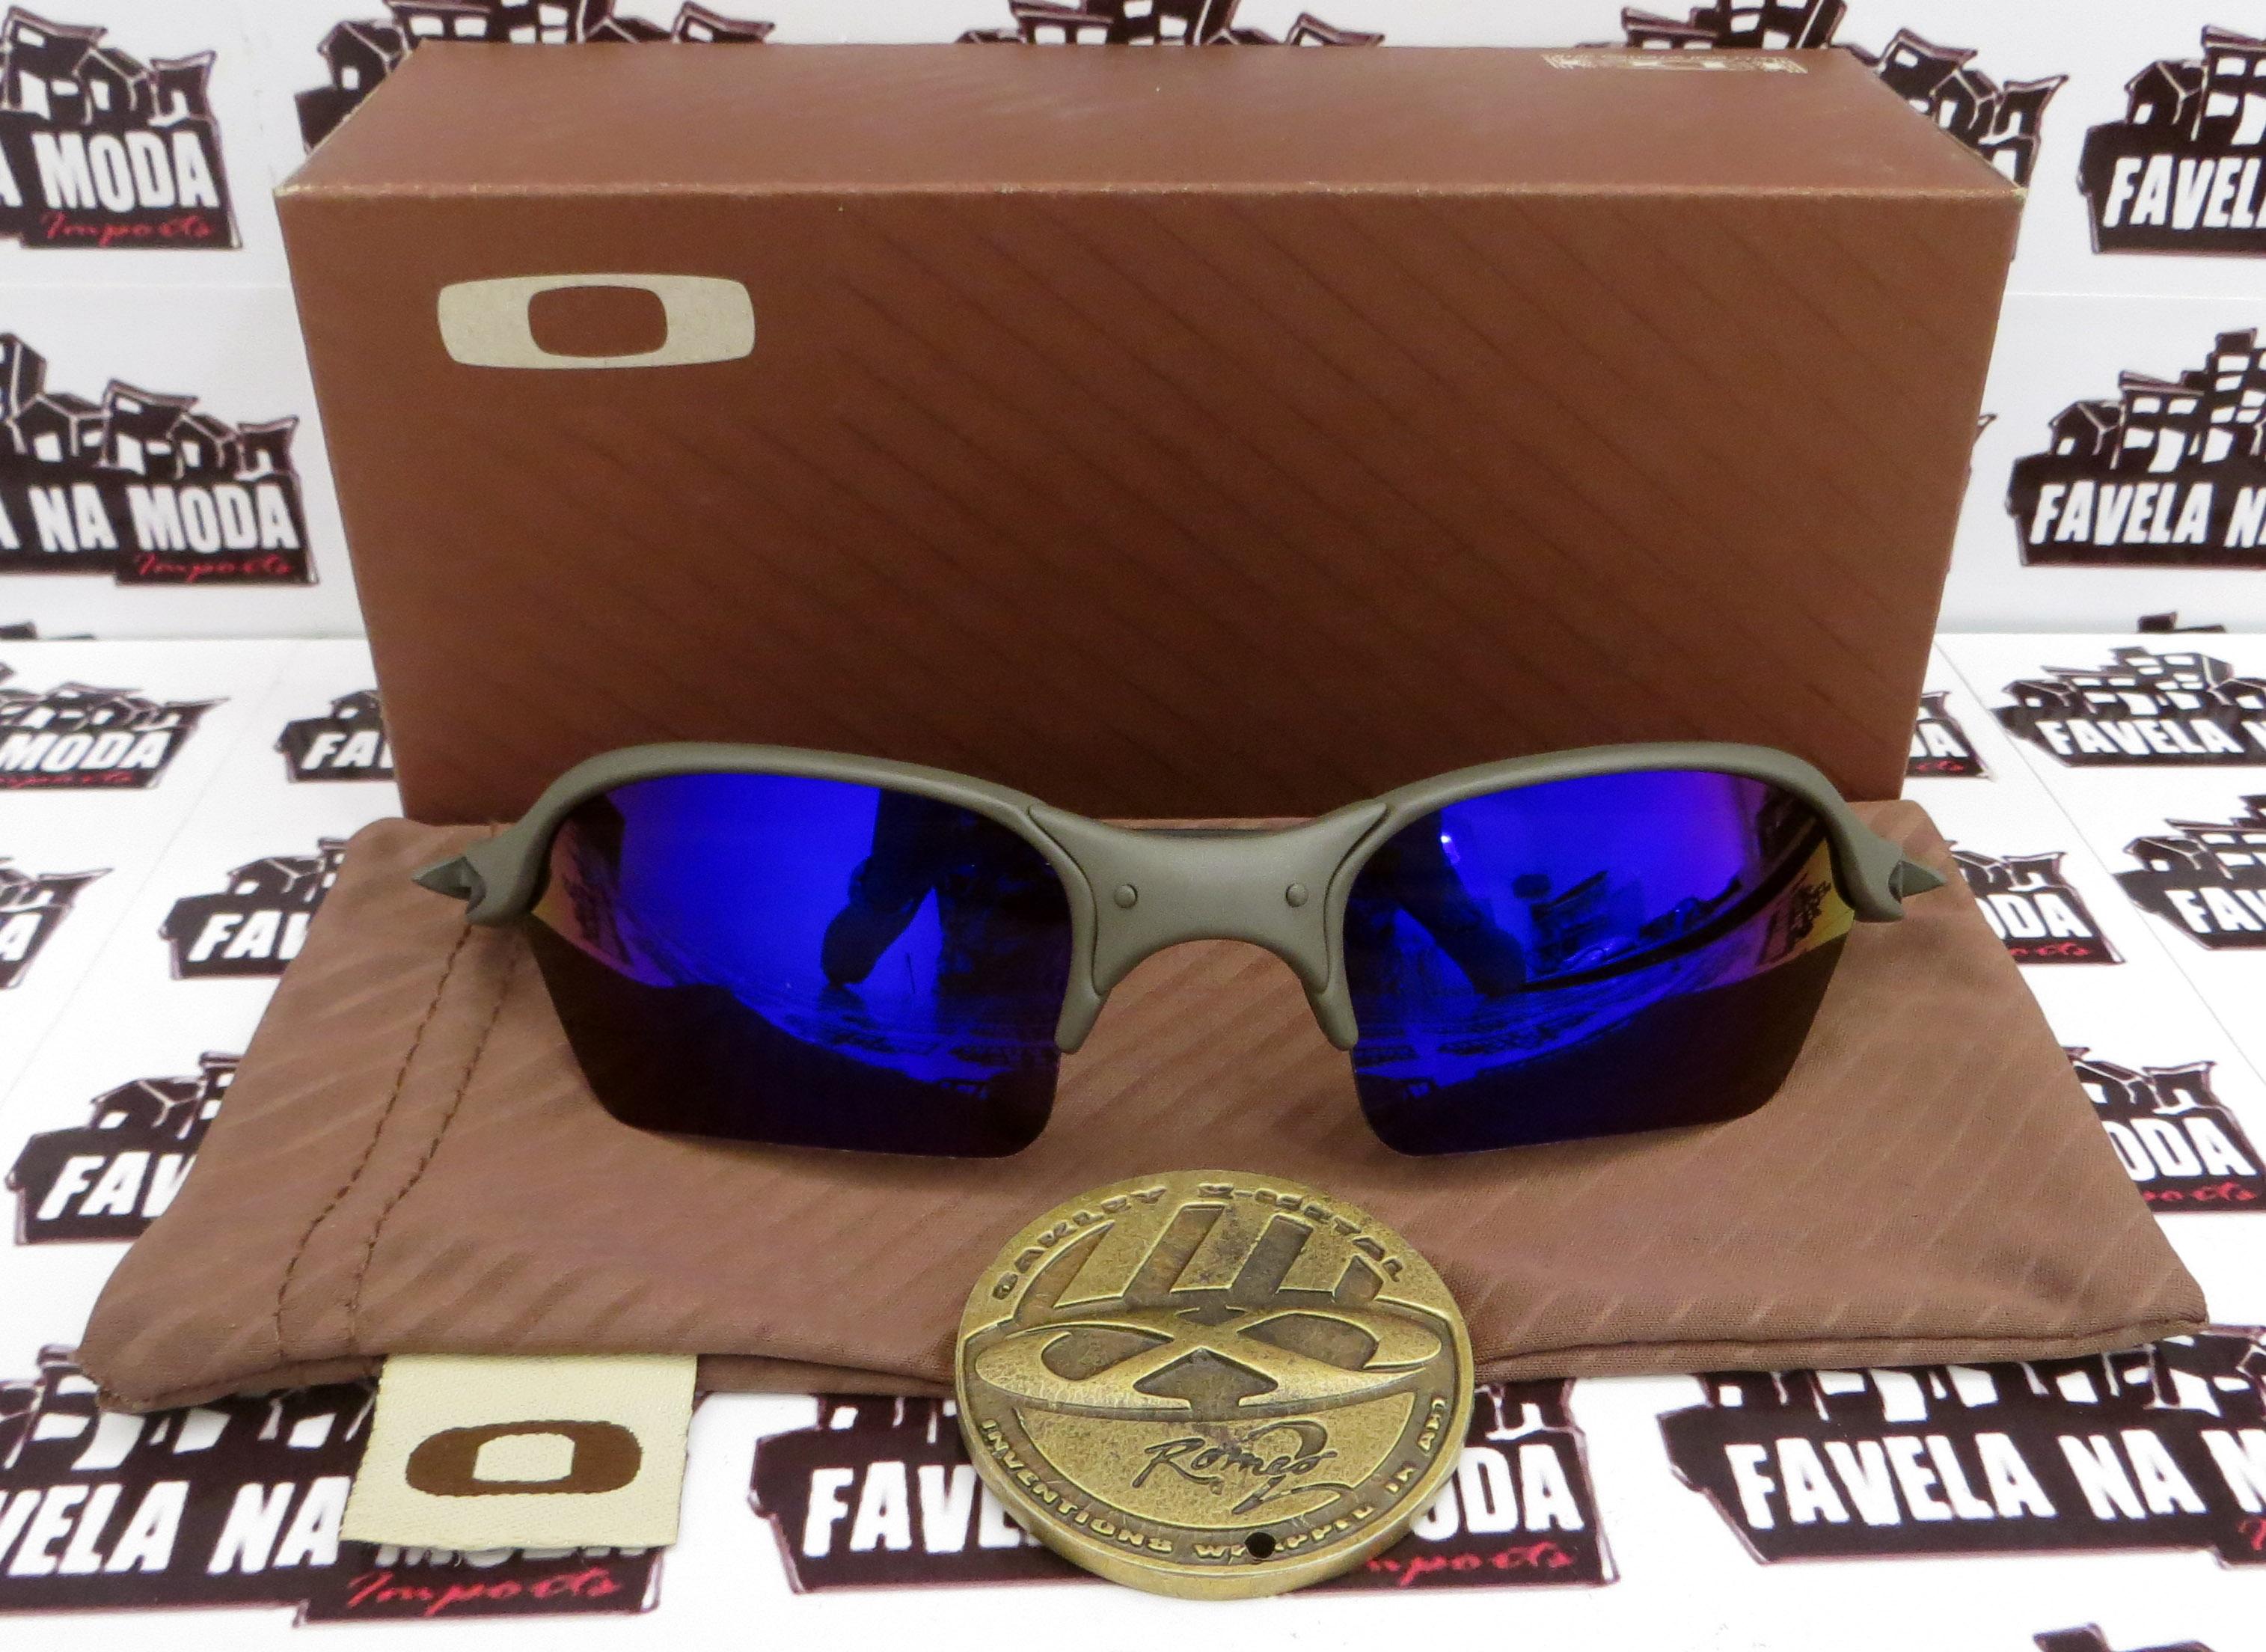 9b6523c1015c1 Óculos Oakley Romeo 2 - X-Metal   Magic Blue  Borrachas Pretas ...